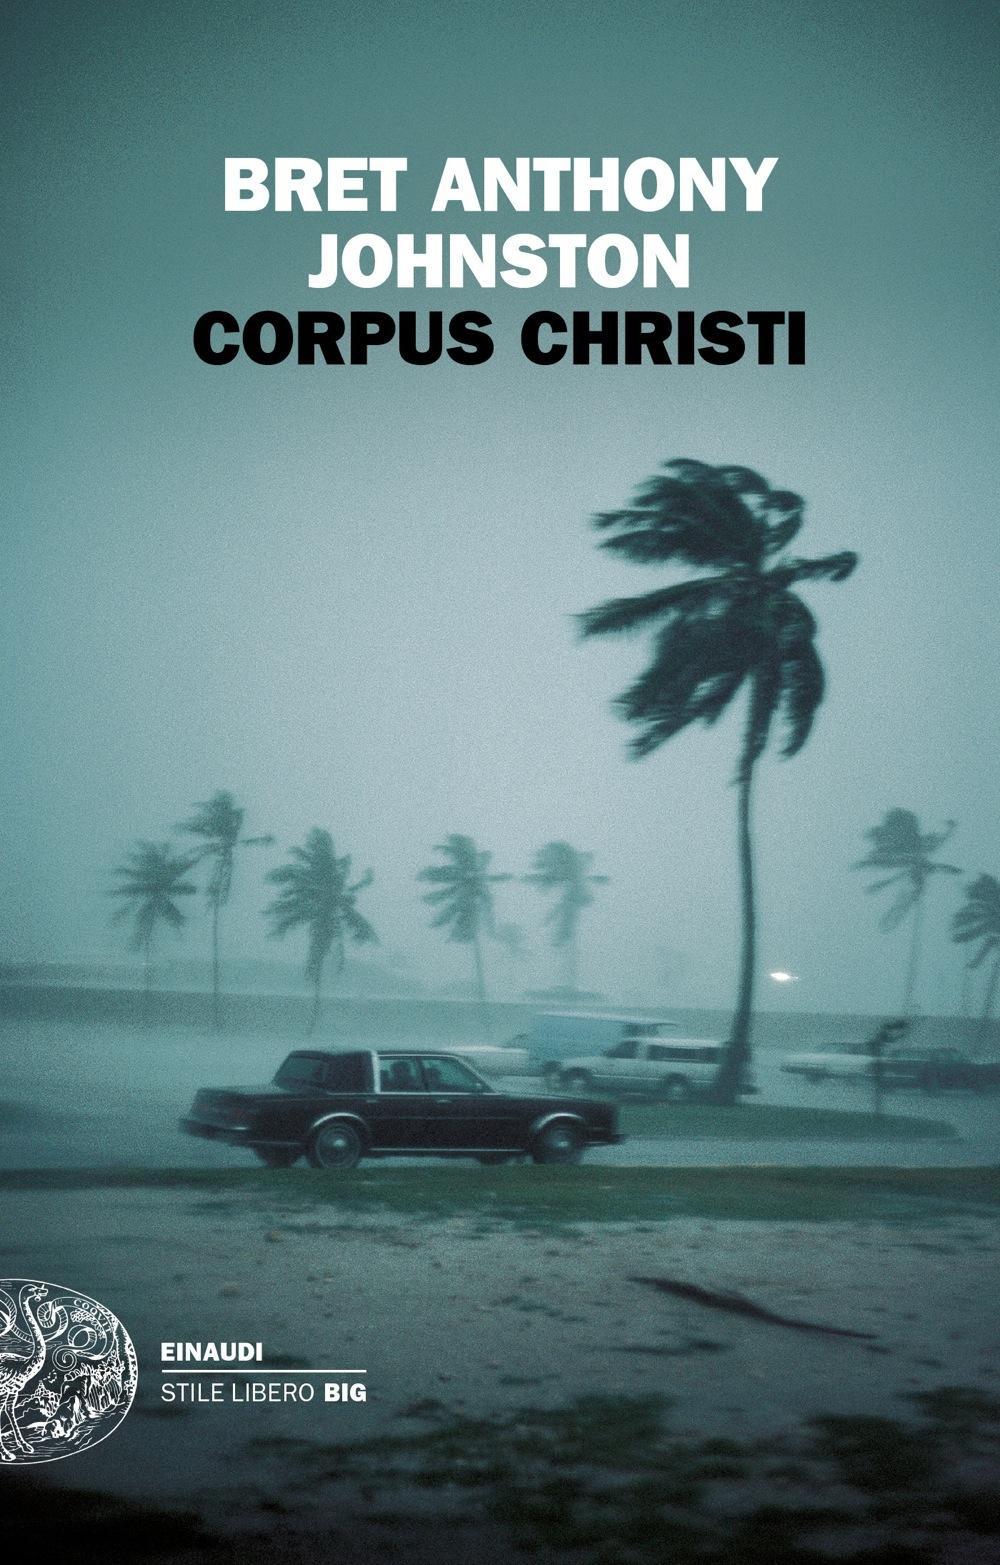 Corpus Christi, Bret Anthony Johnston. Giulio Einaudi Editore - Stile  libero Big